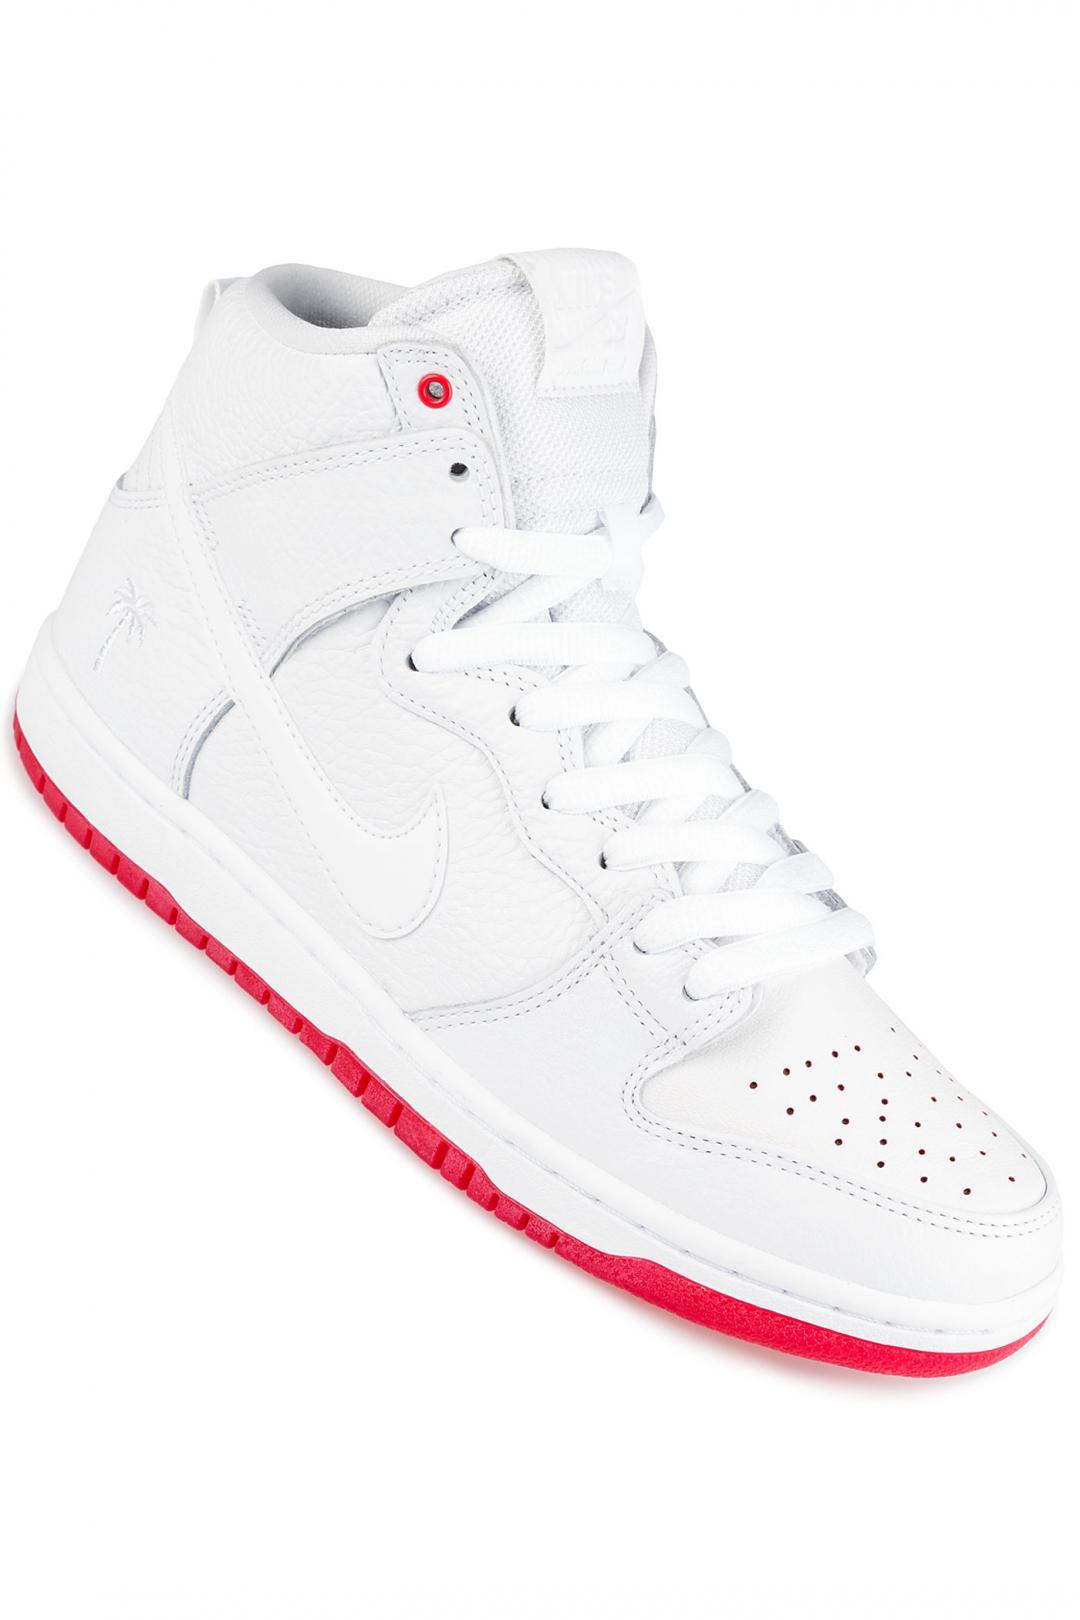 Uomo Nike SB Zoom Dunk High Kevin Bradley QS white white university red   Sneaker